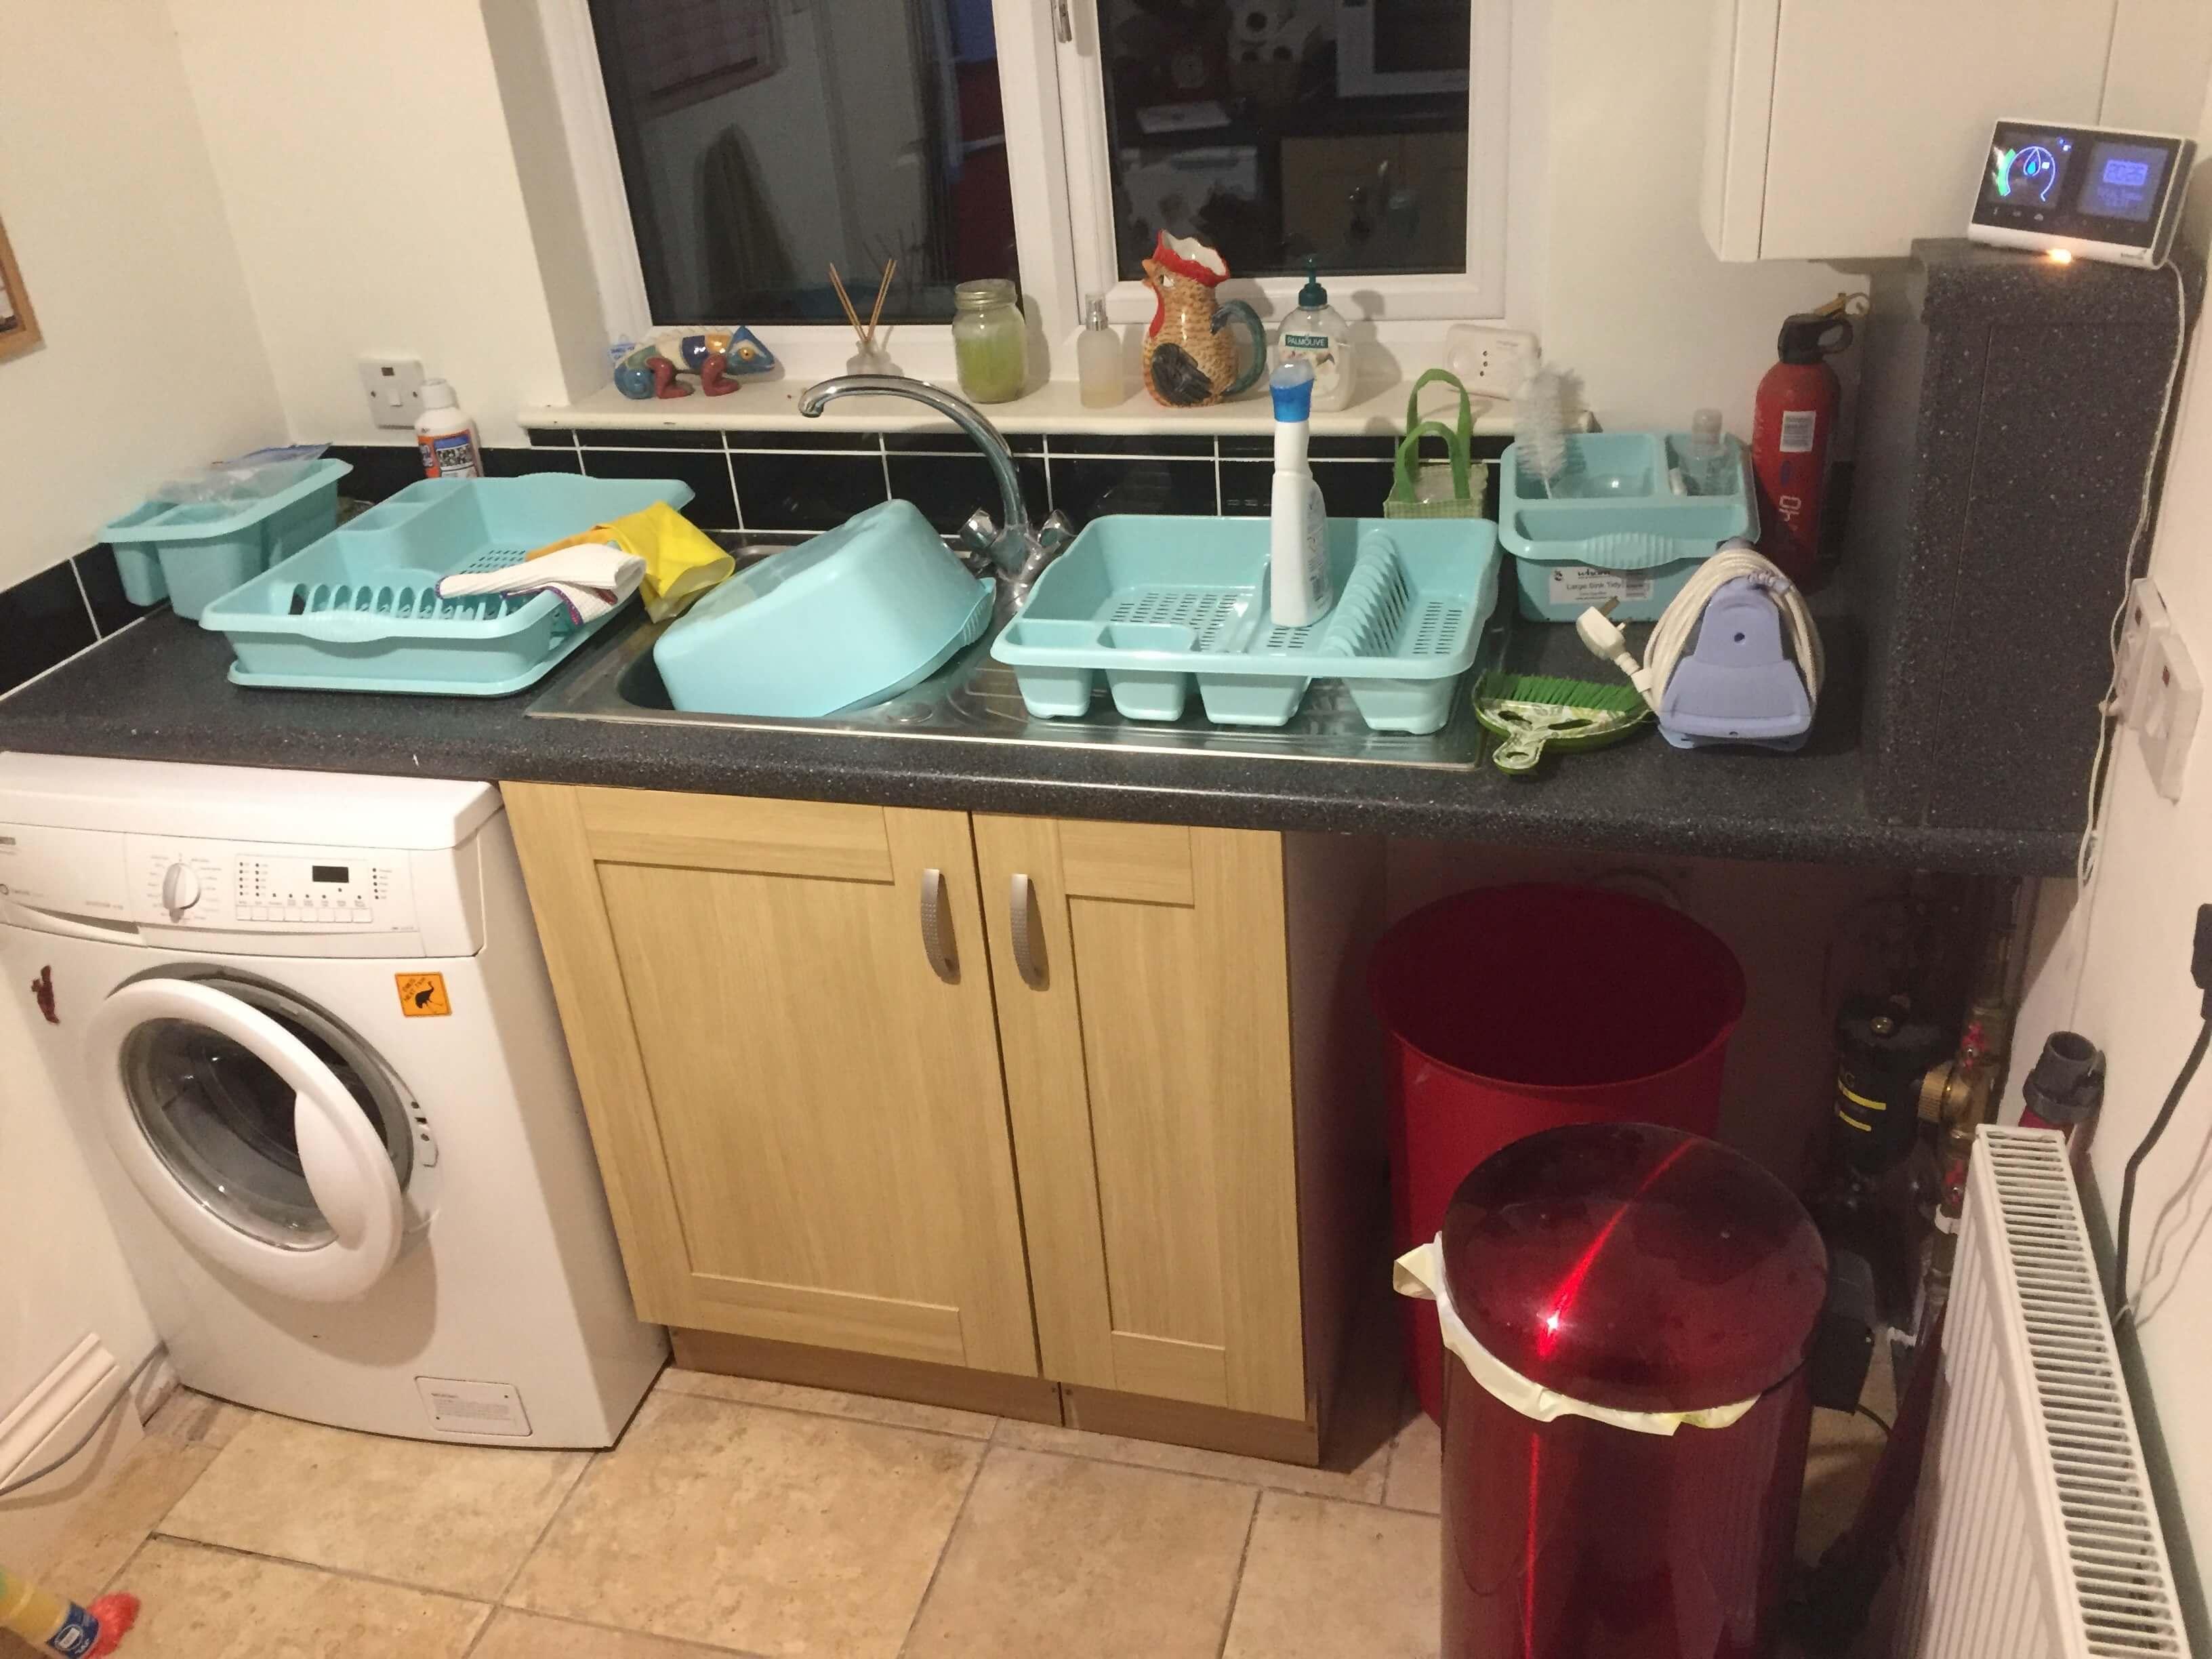 Old Utility sink run